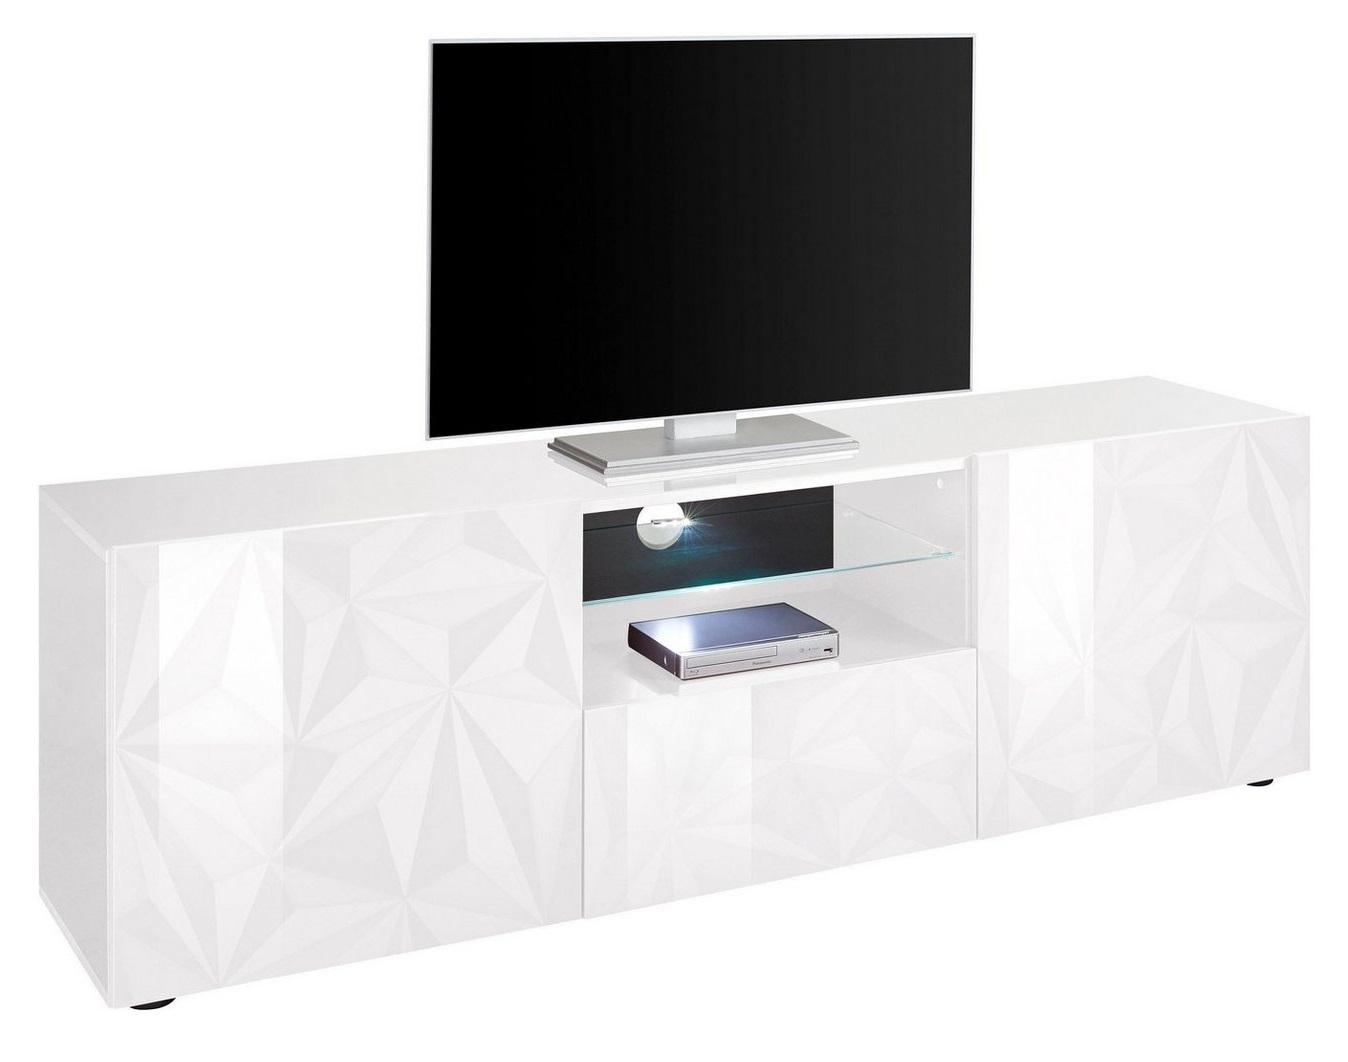 Tv-meubel Kristal 181 cm breed in hoogglans wit   Pesaro Mobilia